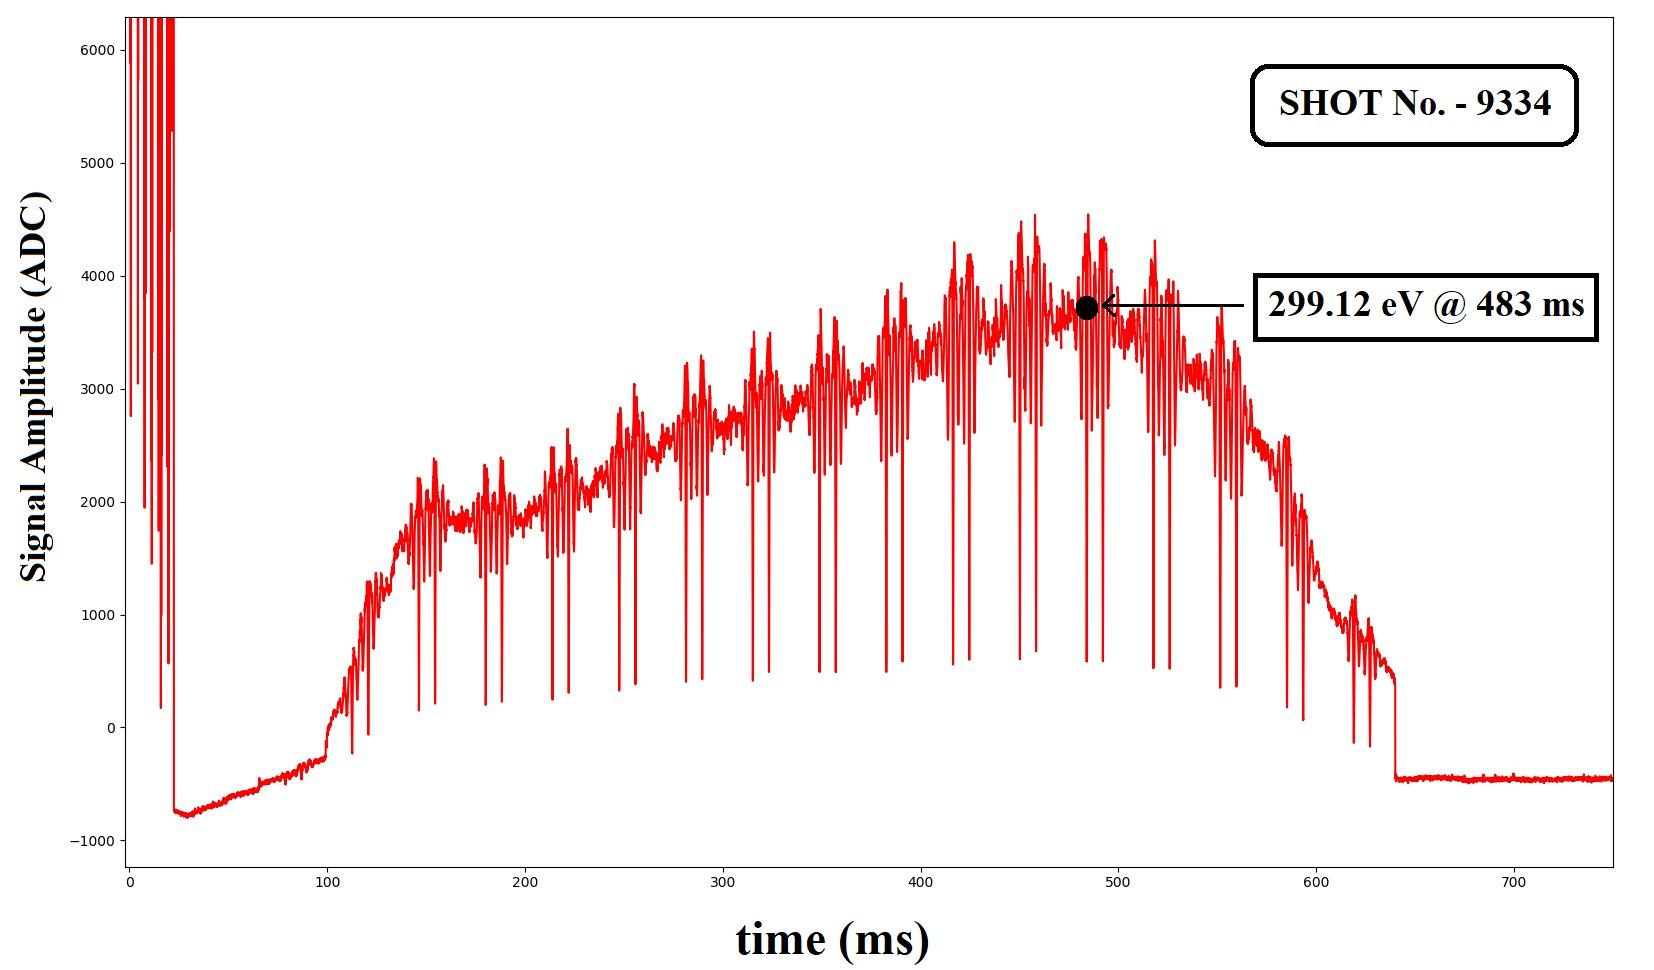 Figure-3: Plasma Data